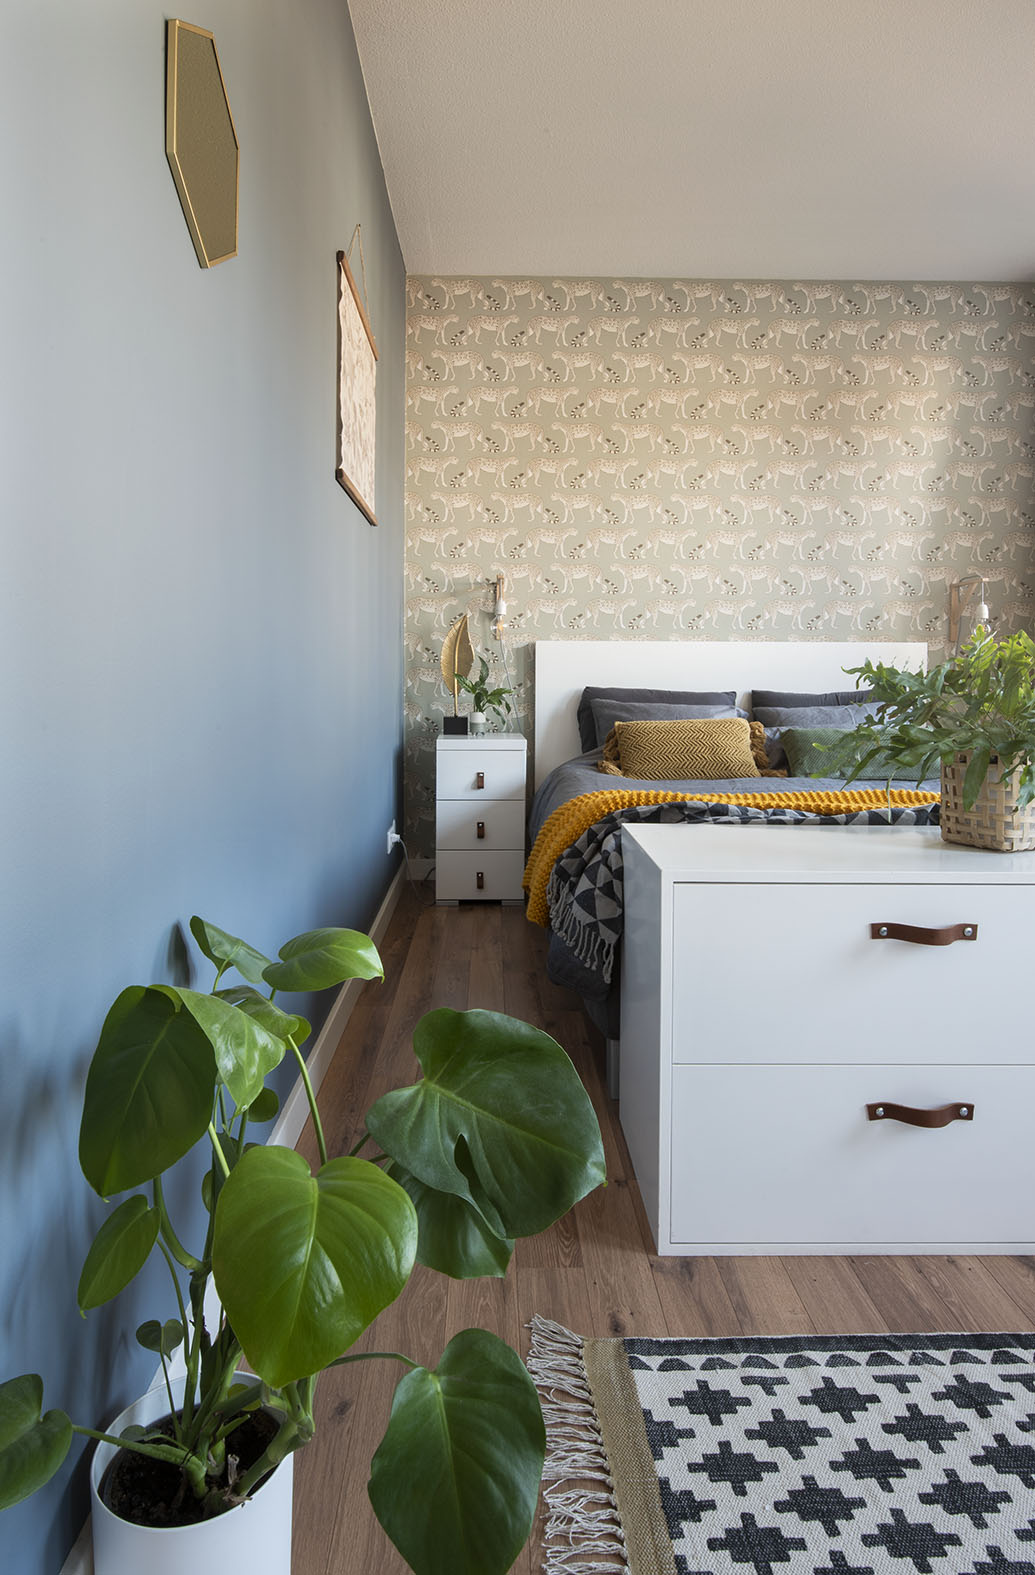 Slaapkamer-interieur-ontwerp-blauw-luipaard-styling-groen-2